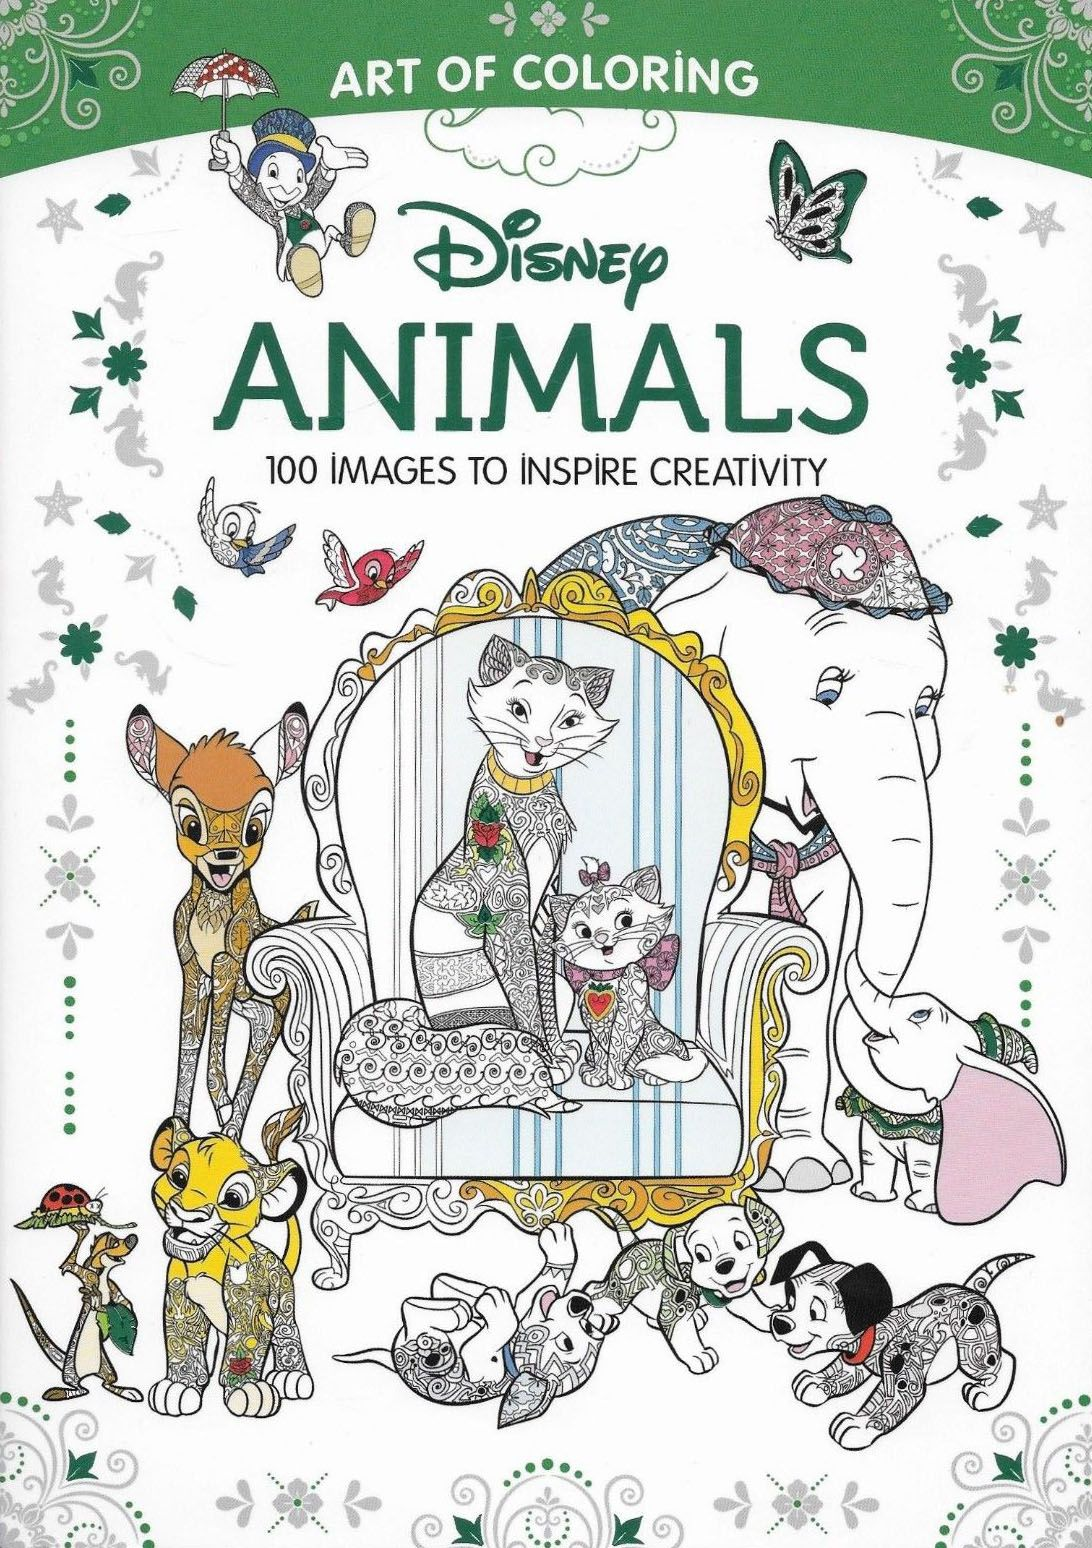 Art of Coloring Disney Animals | Disney Books, VHS, & DVDs | Pinterest